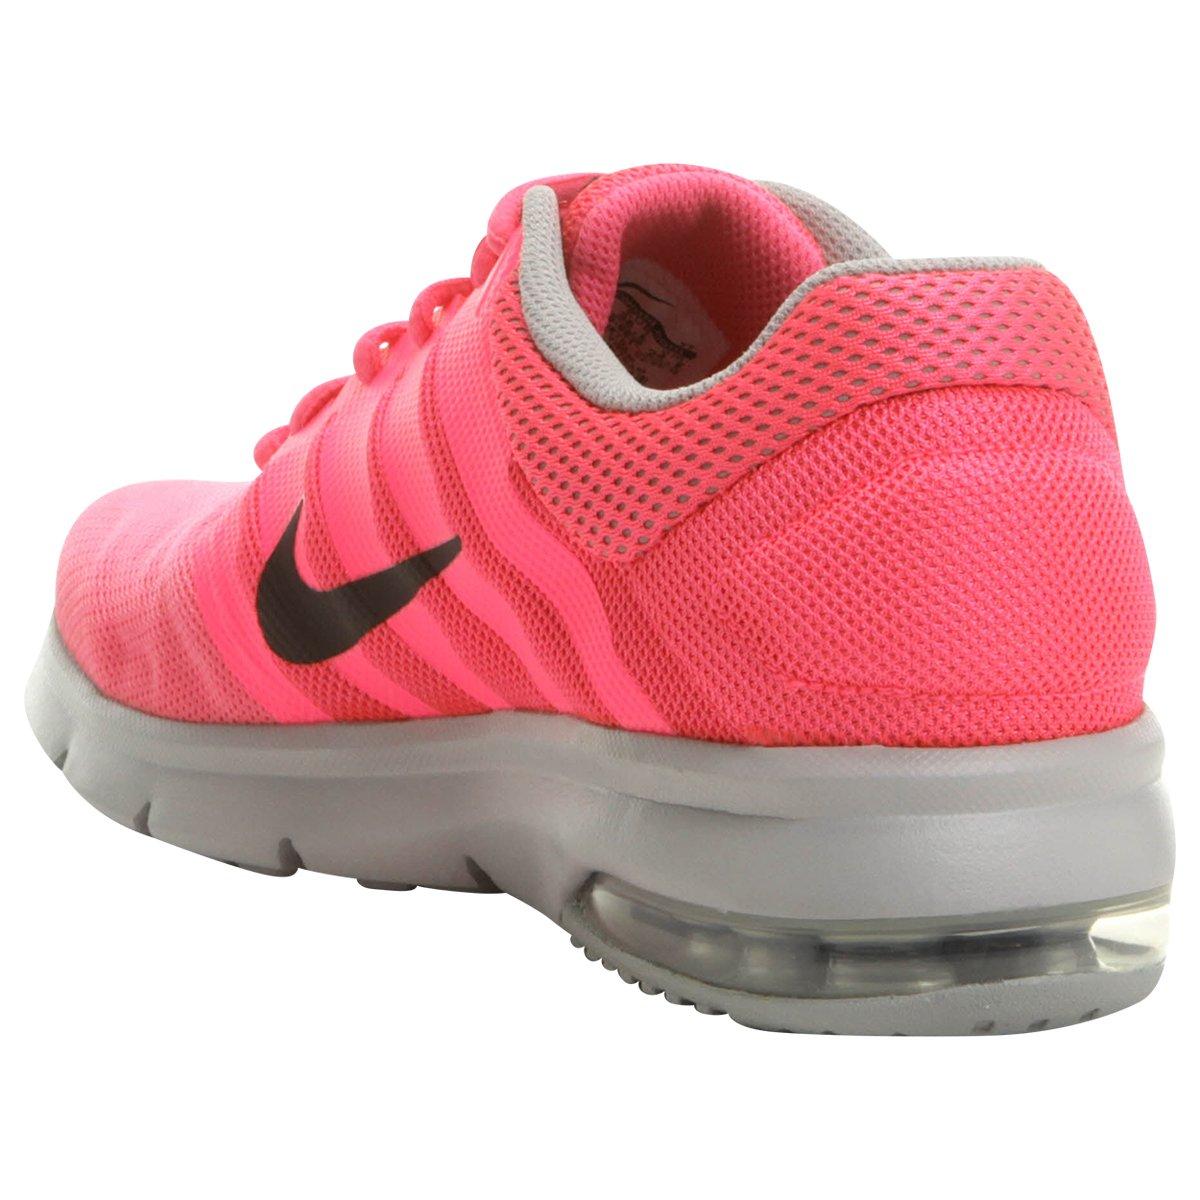 ... cc24231473e Tênis Nike Air Max Era Feminino - Rosa e Cinza - Compre  Agora Loja . aa6a099cd3c Compre Tenis ... 3d2bdcb150692